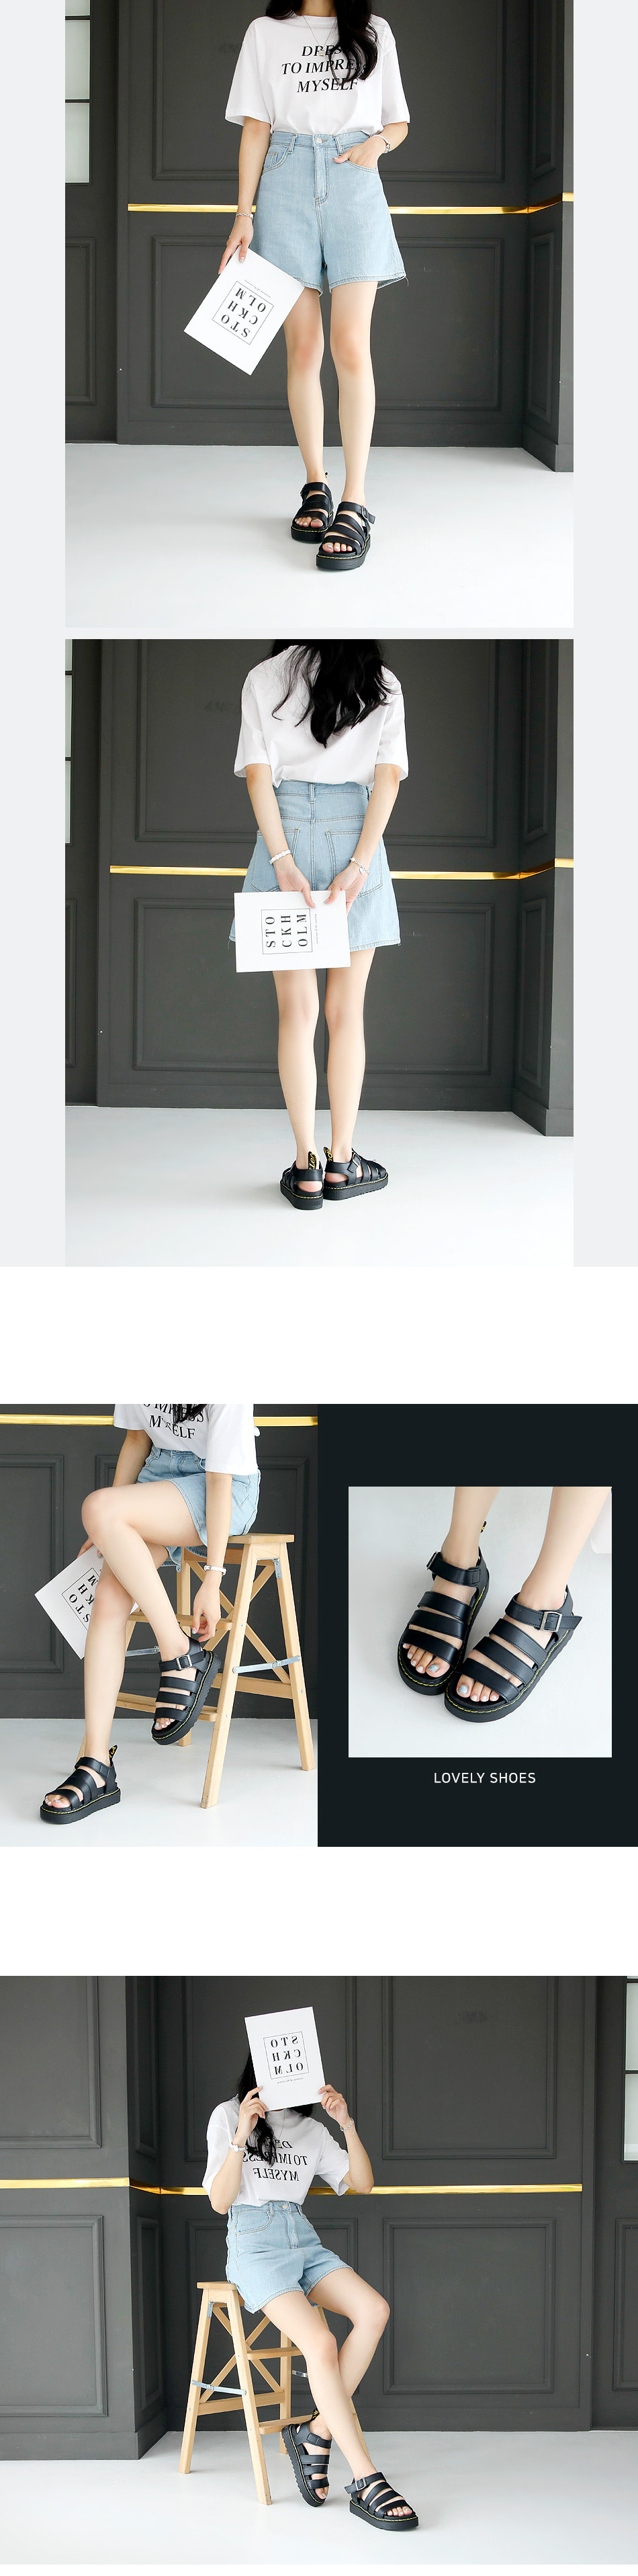 Ted slingback sandals 4 cm